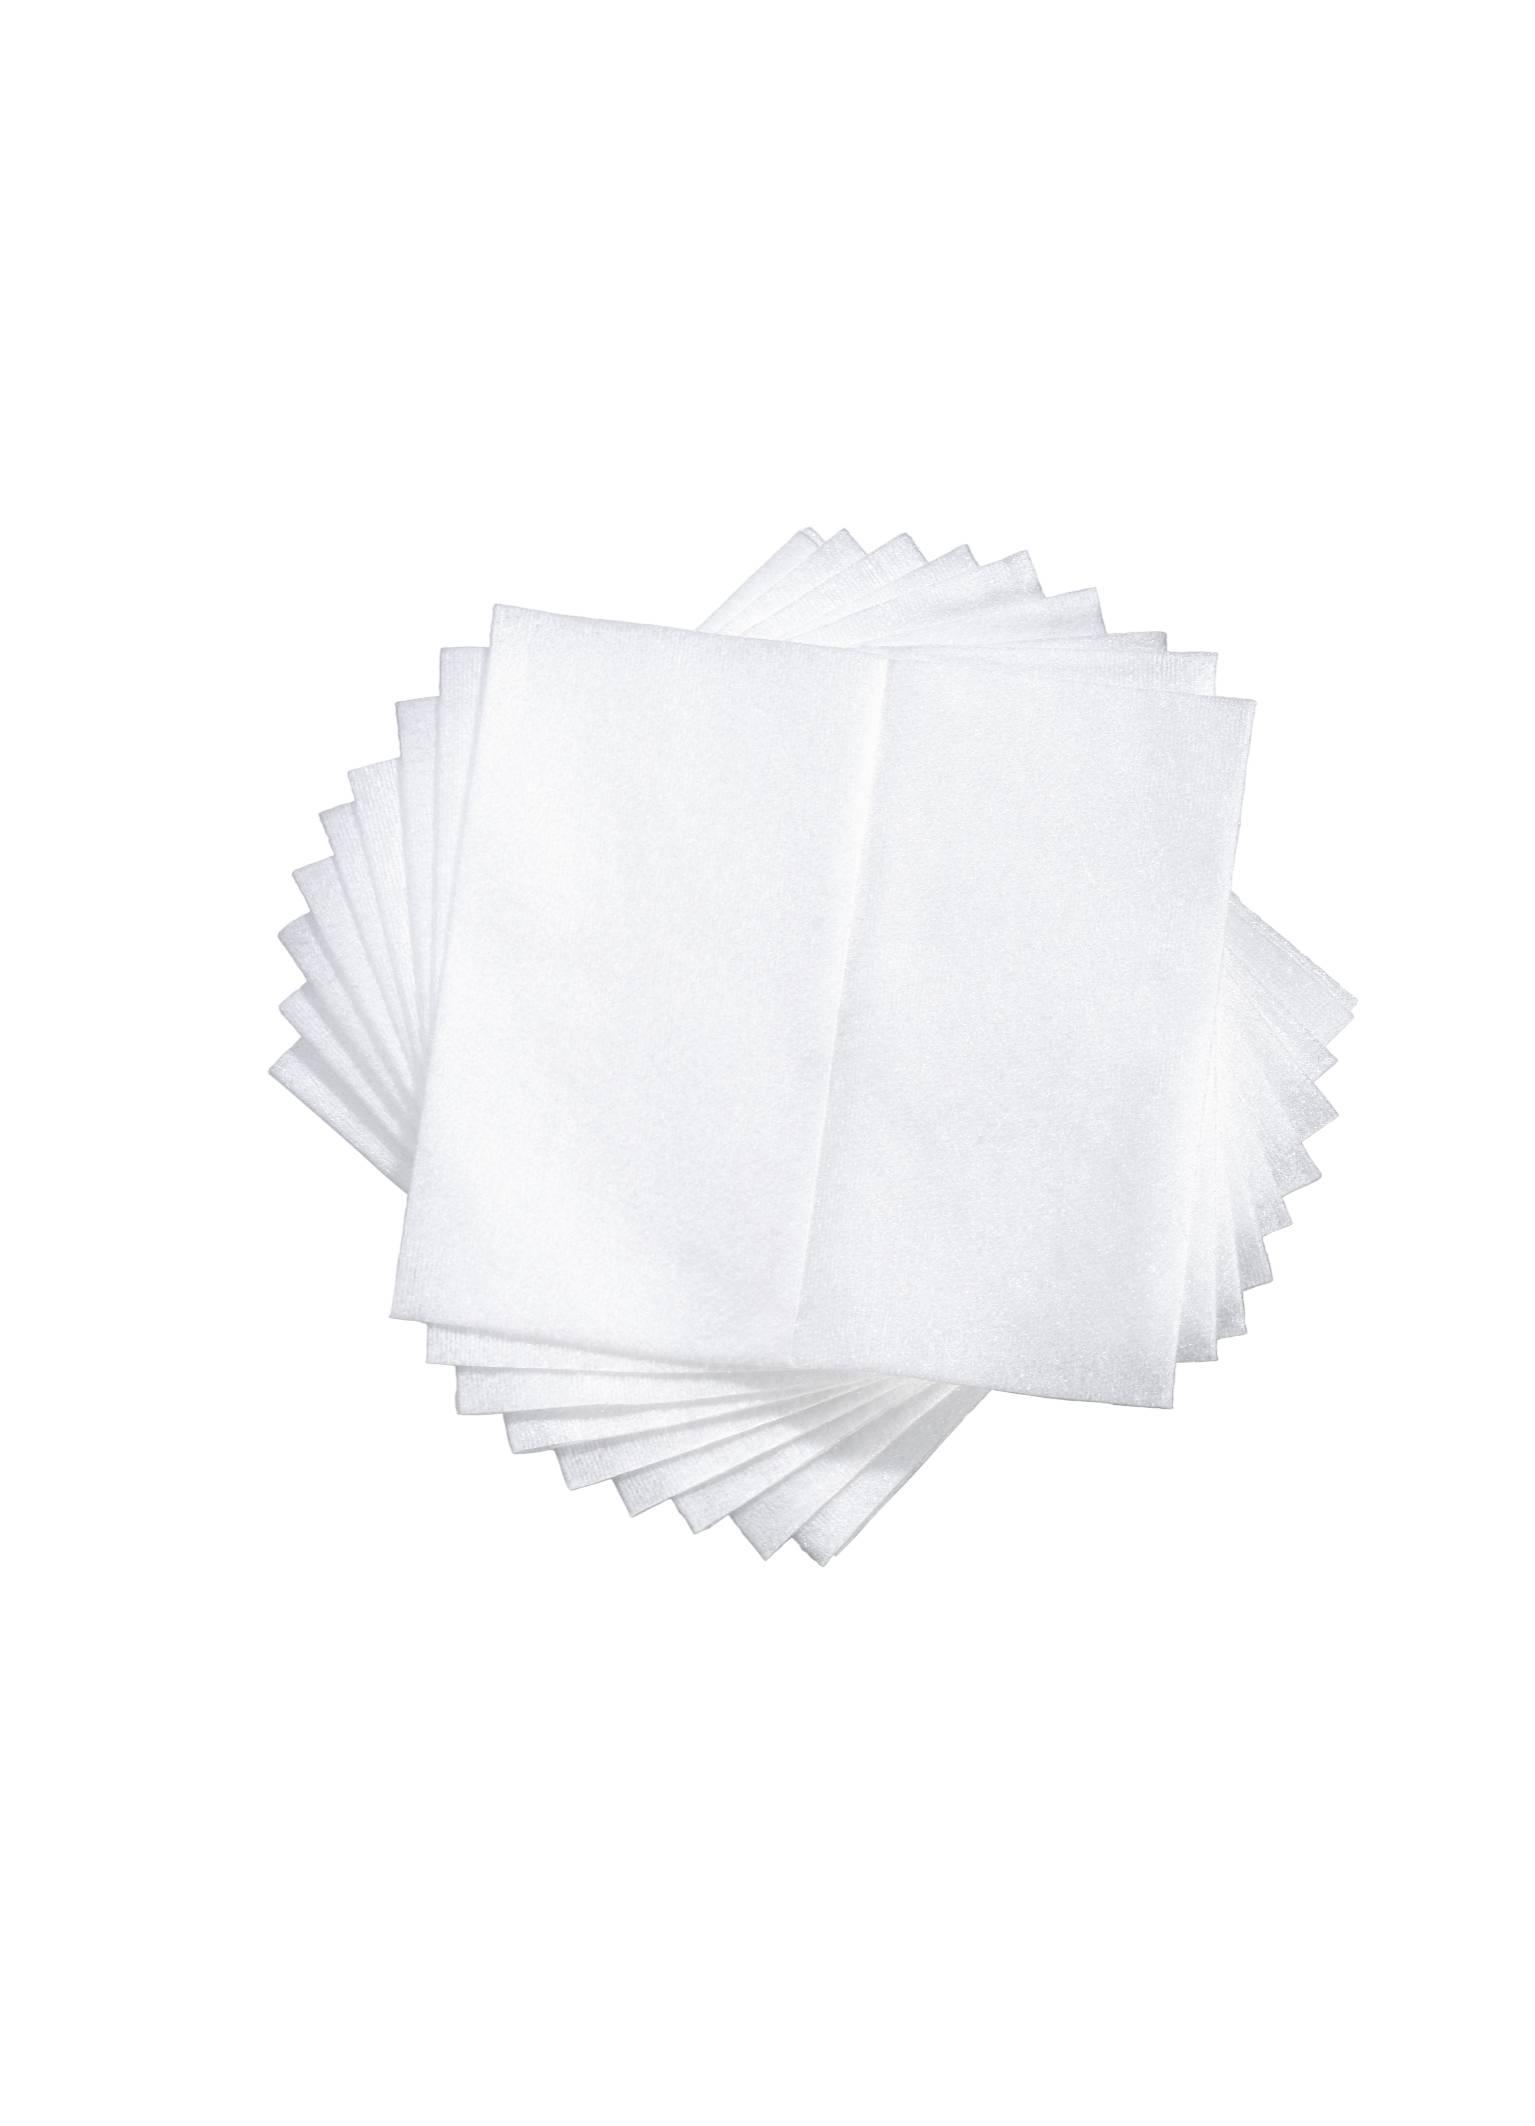 digiclean 10 reinigungstücher